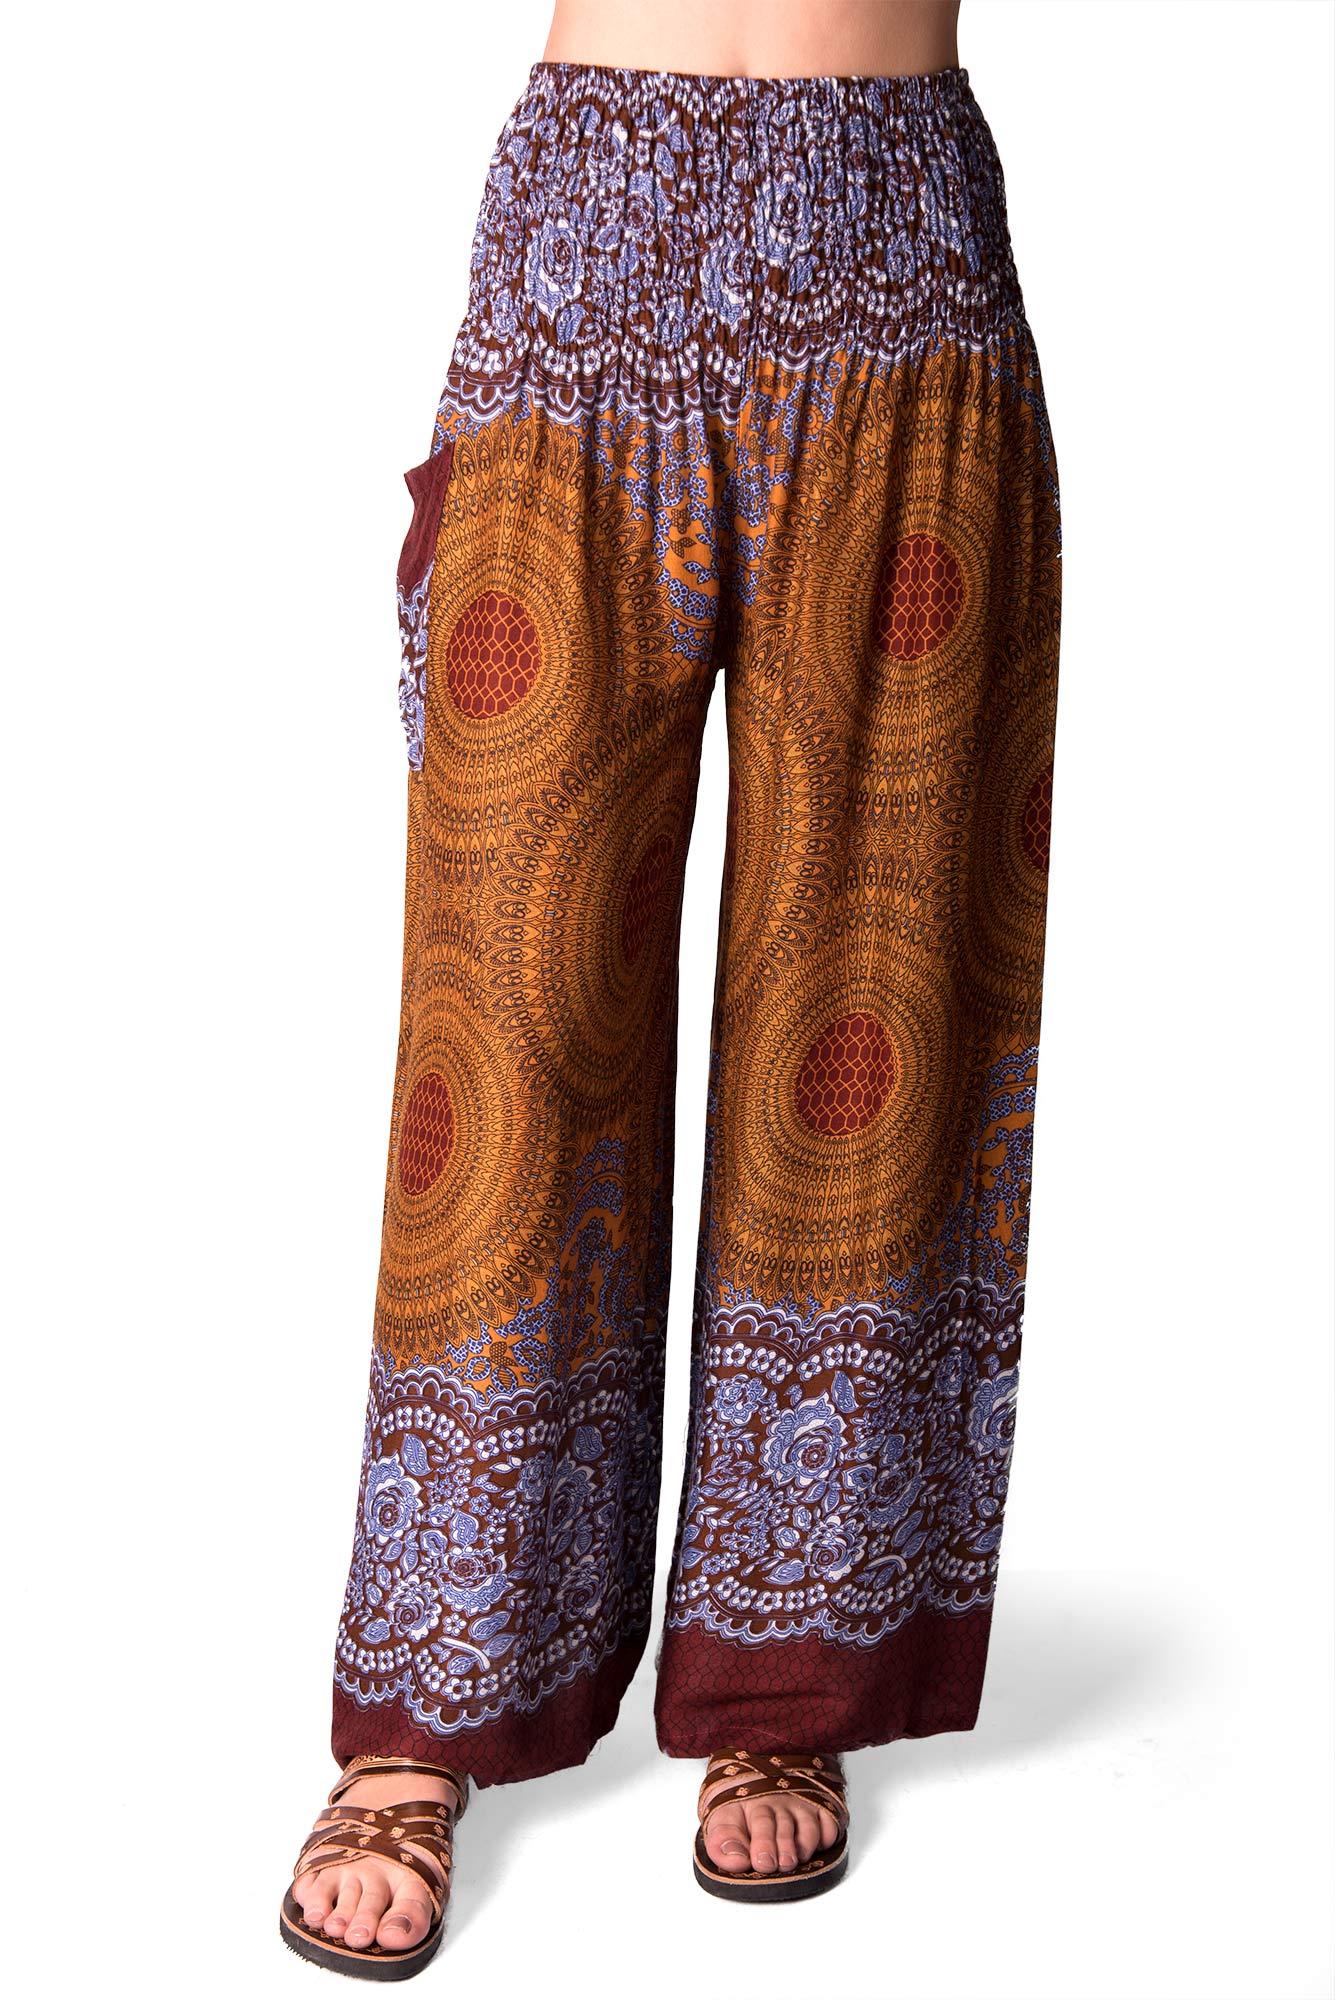 Wide Leg Pants Honeycomb Print, Brown-gold/Rayon